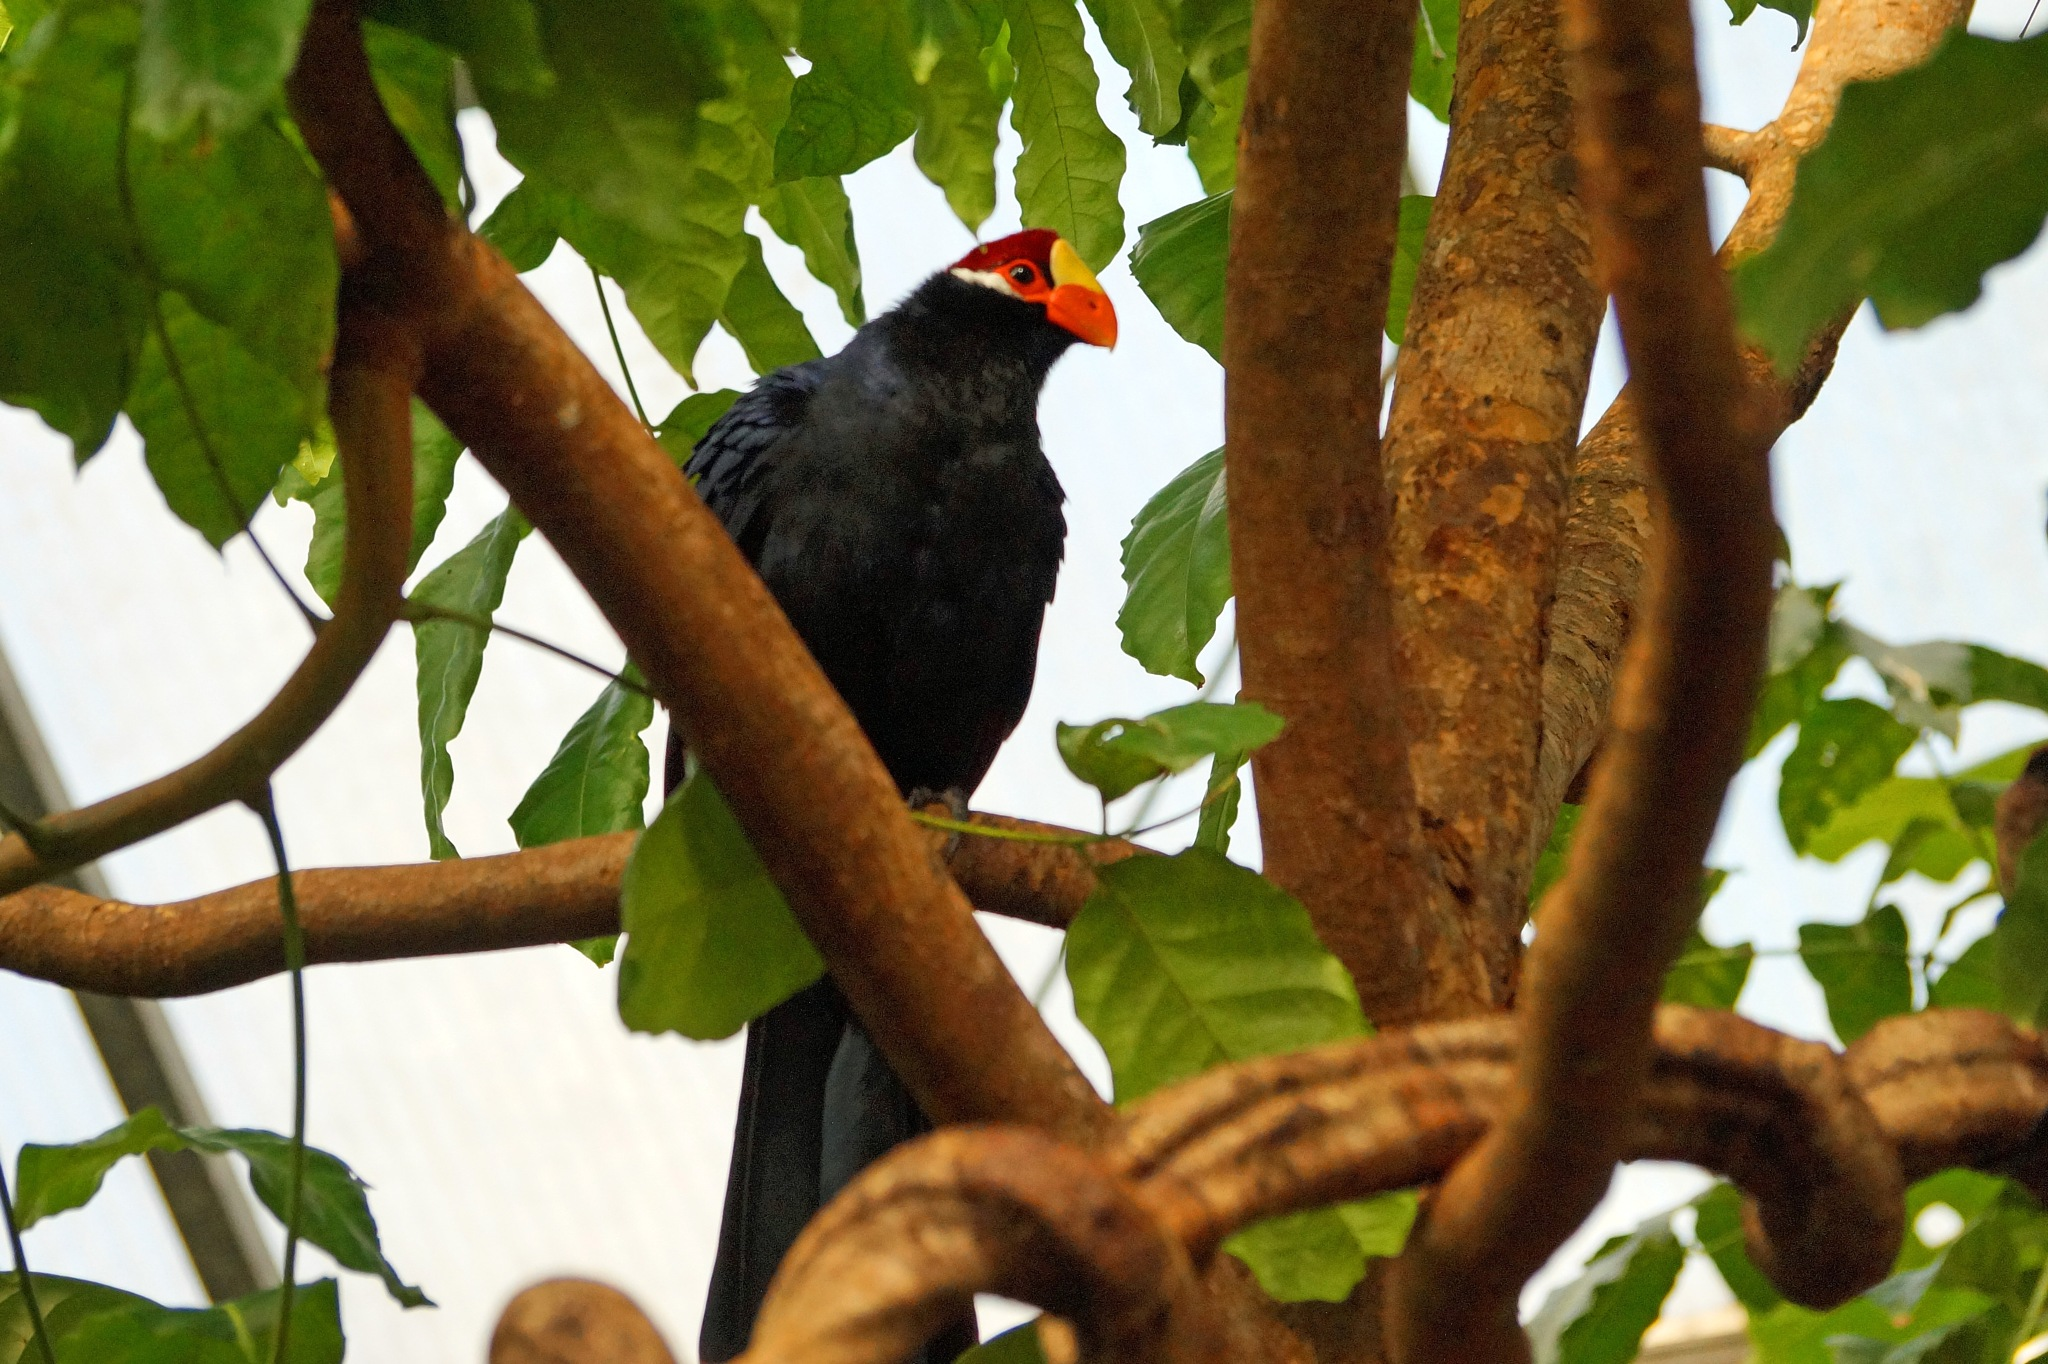 Bird at the Zoo by Marian Baay